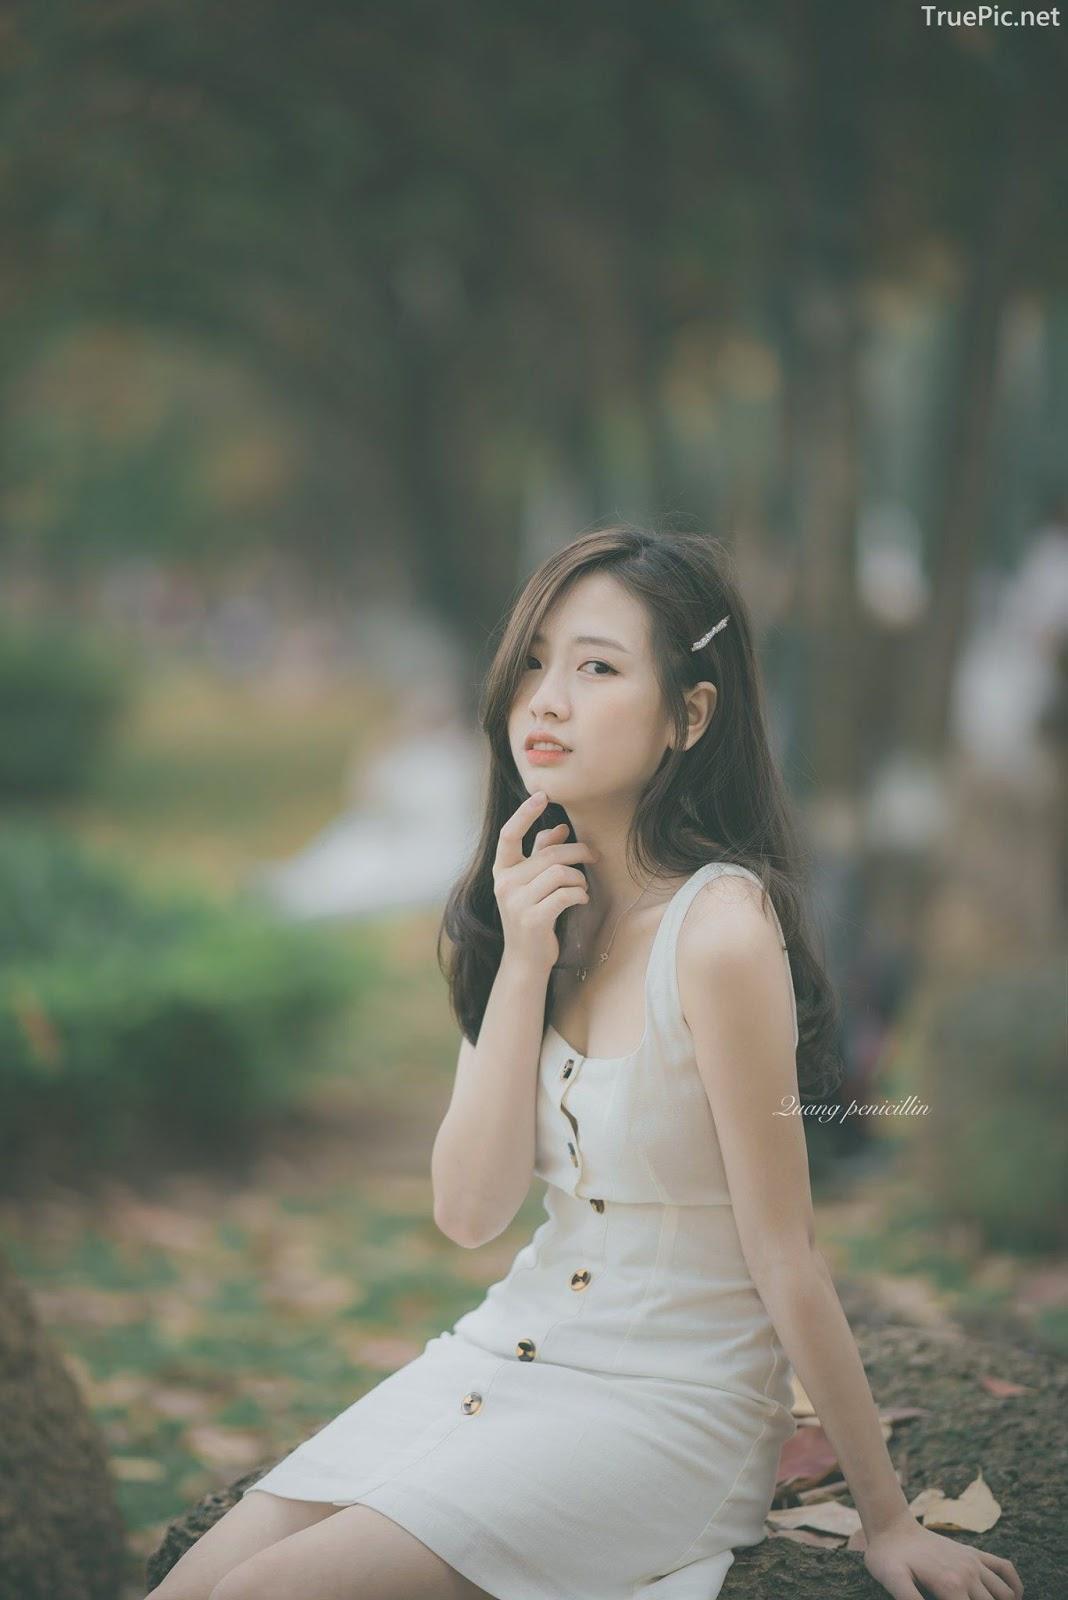 Vietnamese Hot Girl Linh Hoai - Season of falling leaves - TruePic.net - Picture 9